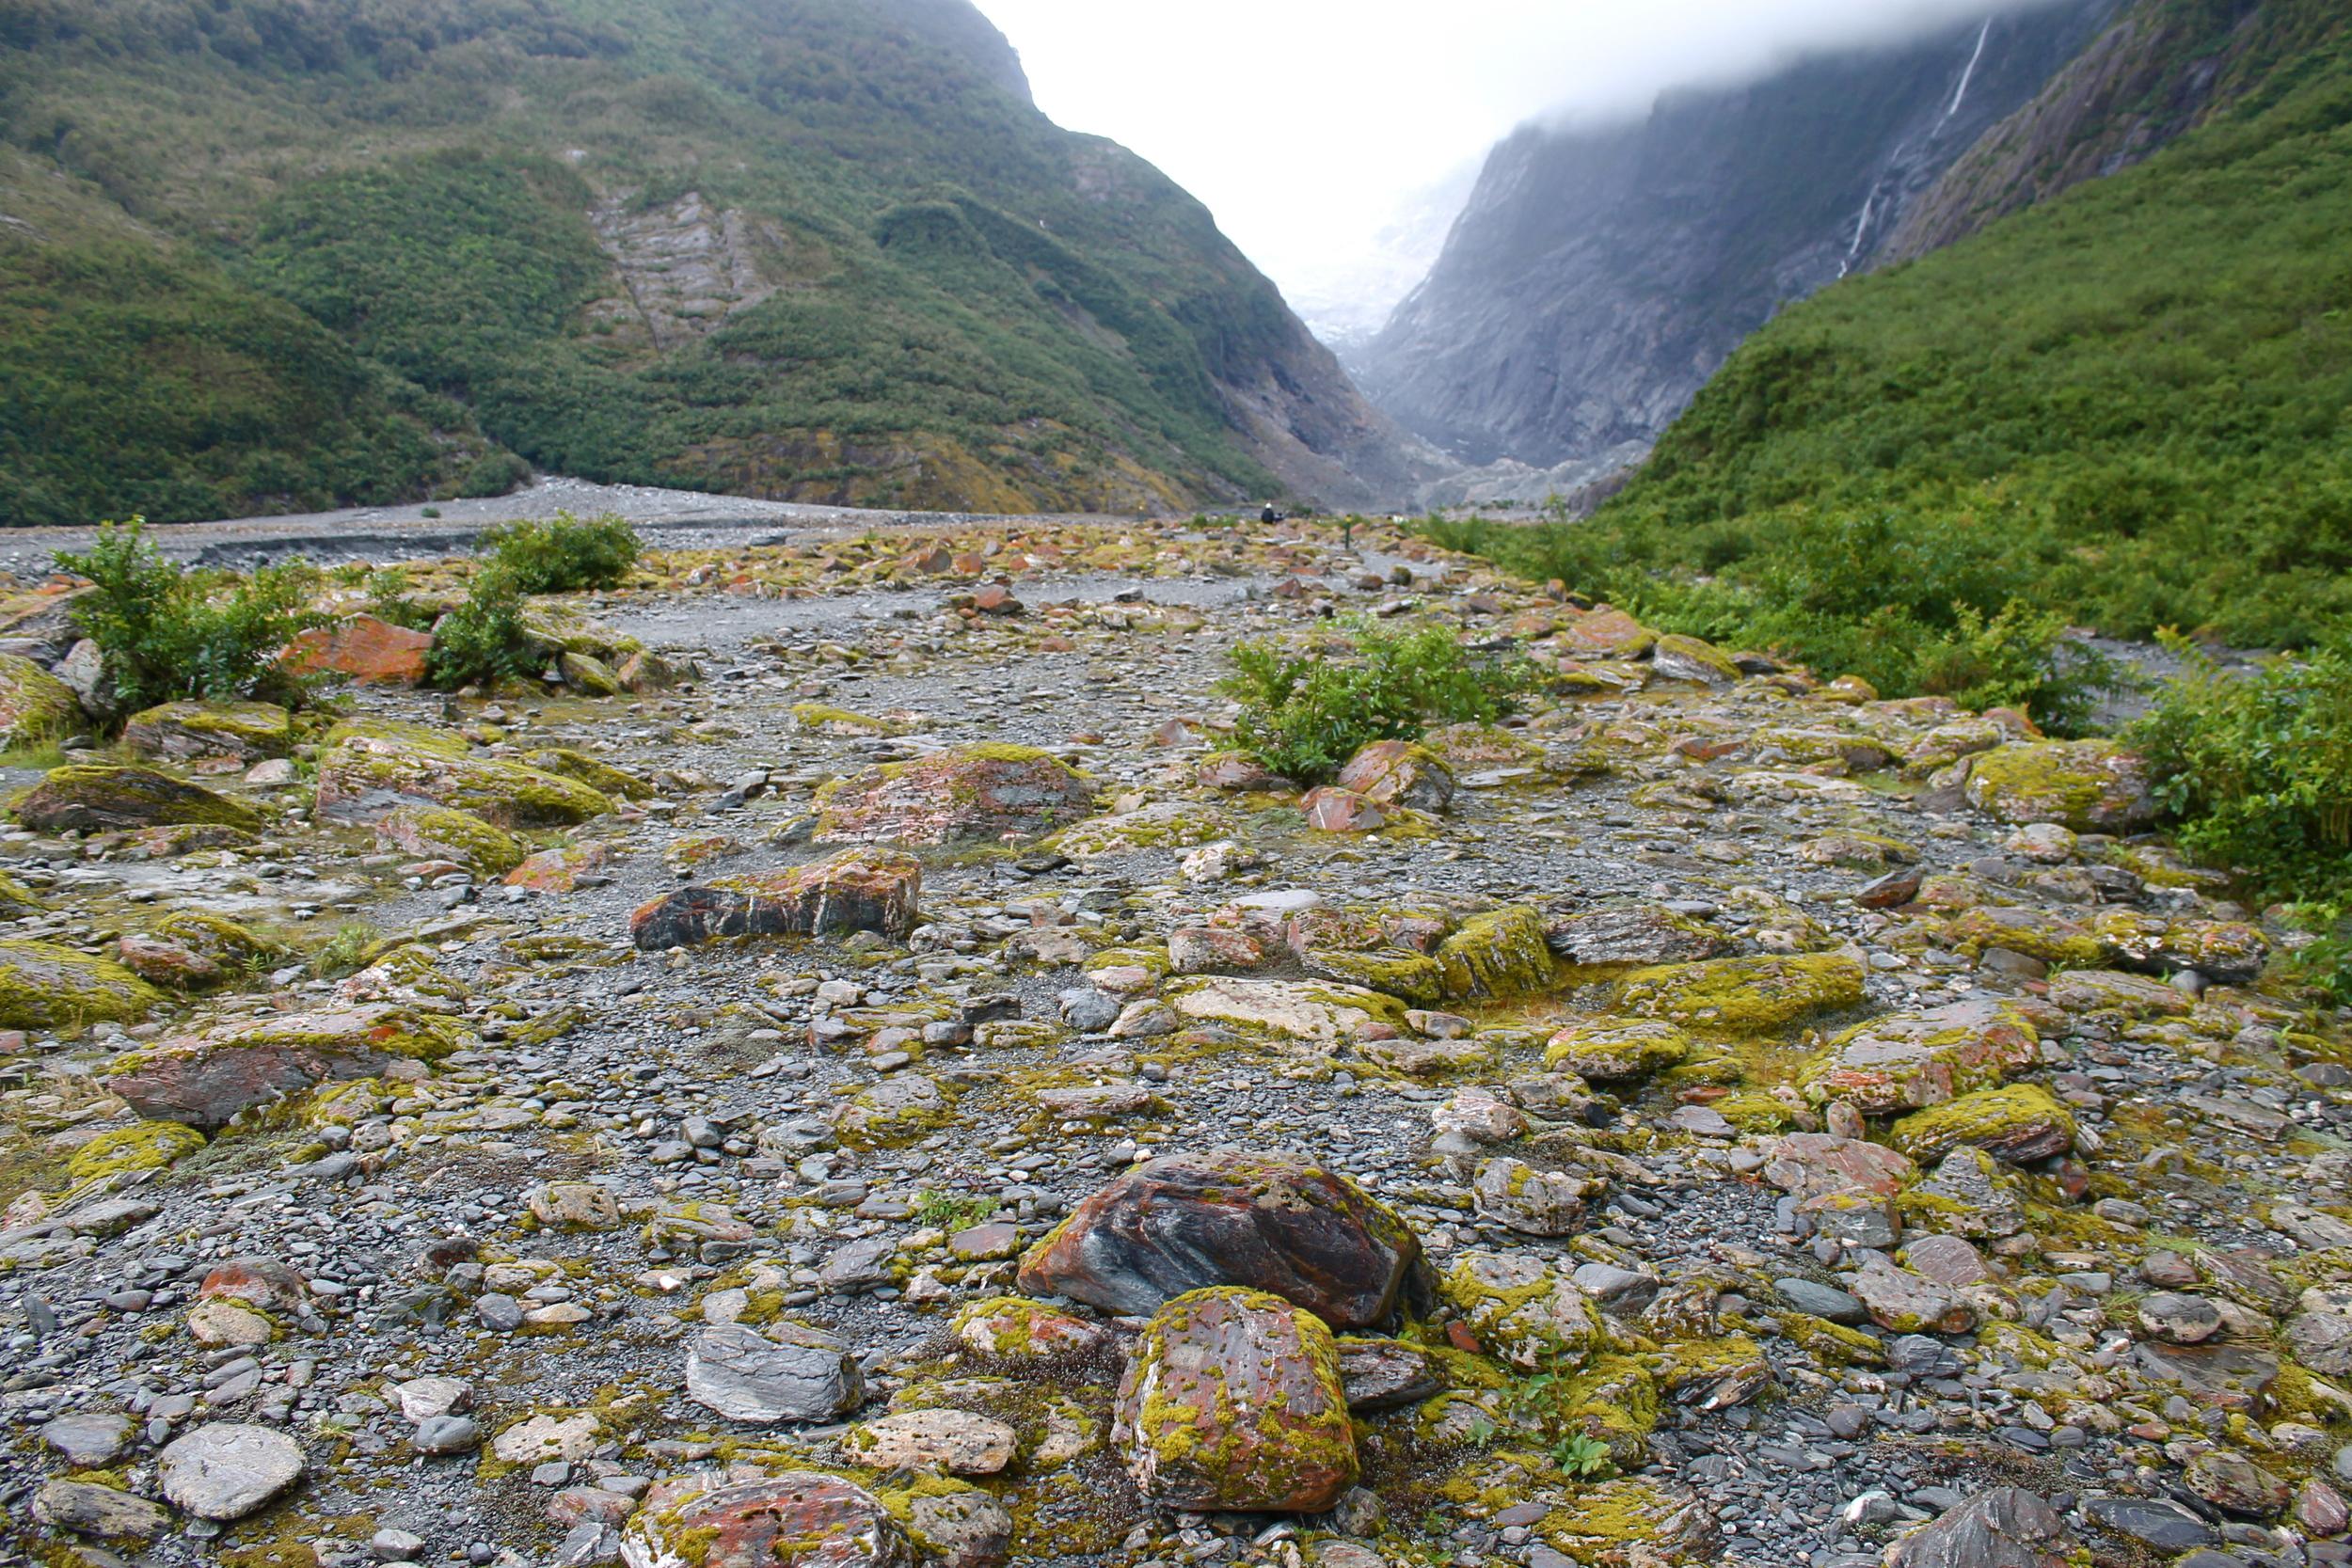 The rocky valley leading up the glacier had a Jackson Pollock-y look to it.